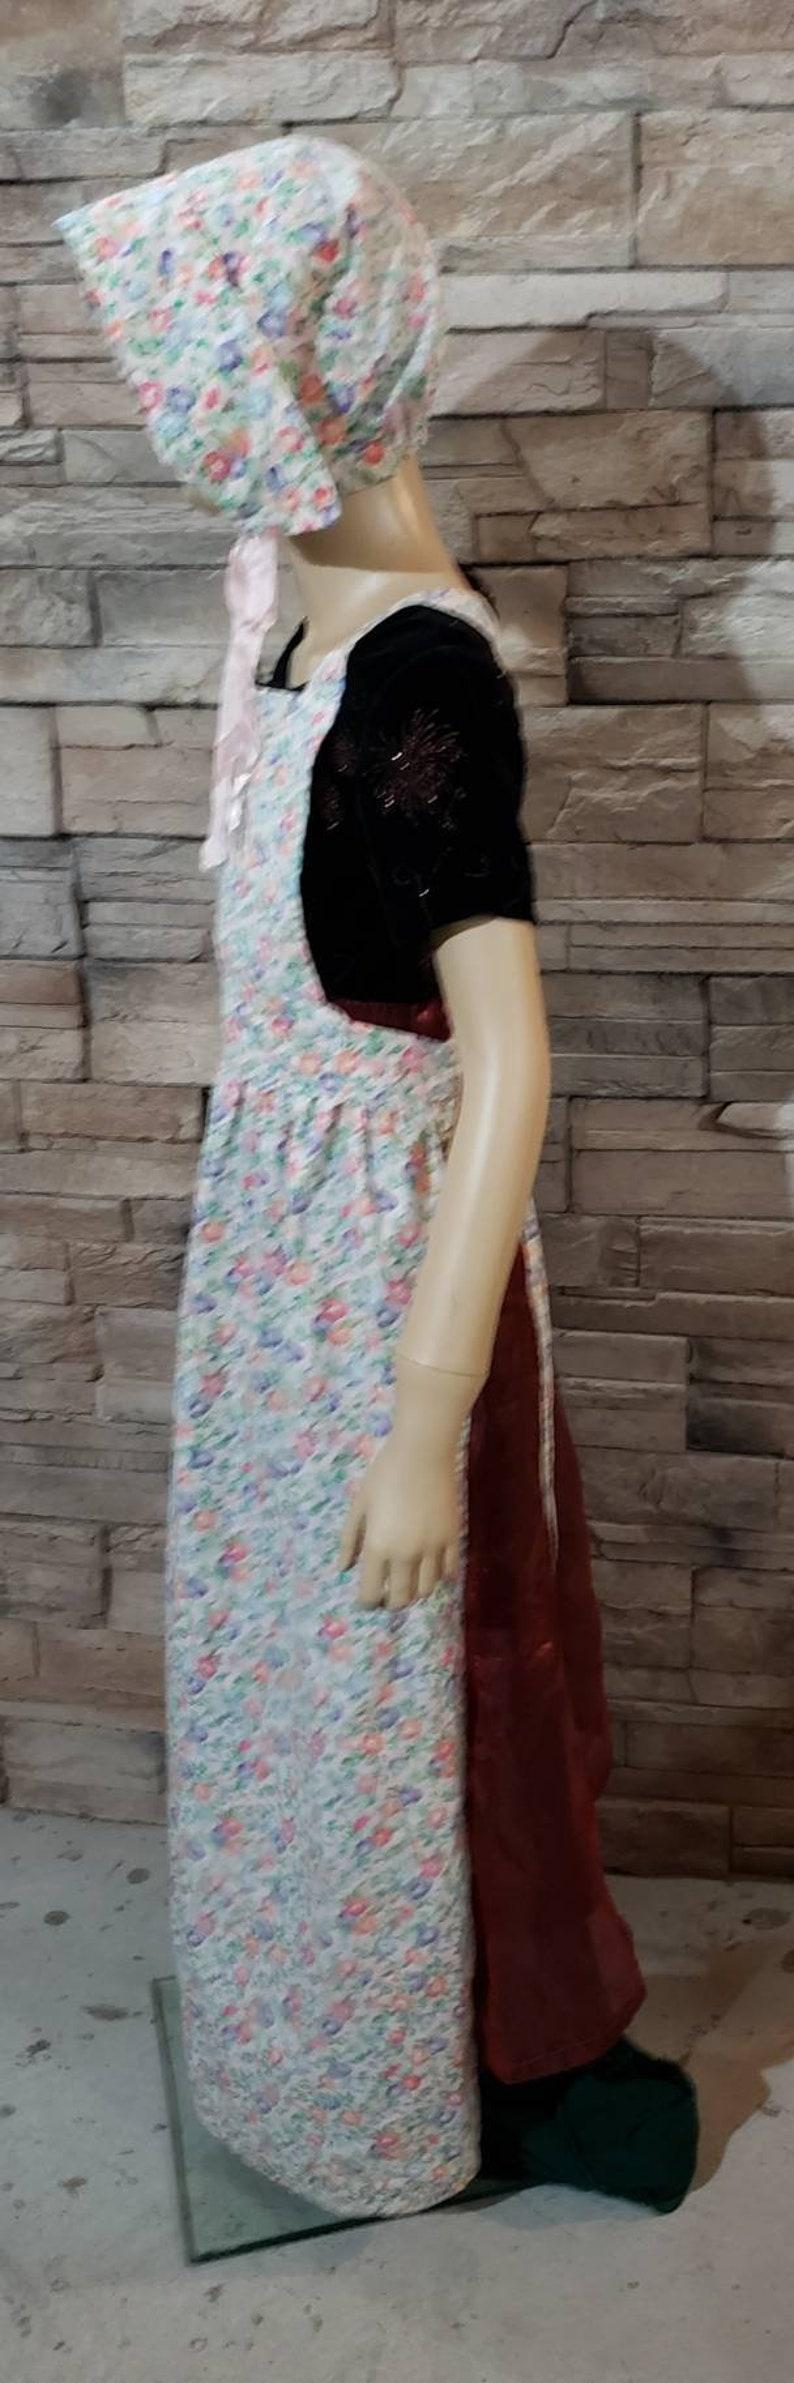 Pilgrim Apron Bonnet Set Pioneer Girl Cosplay